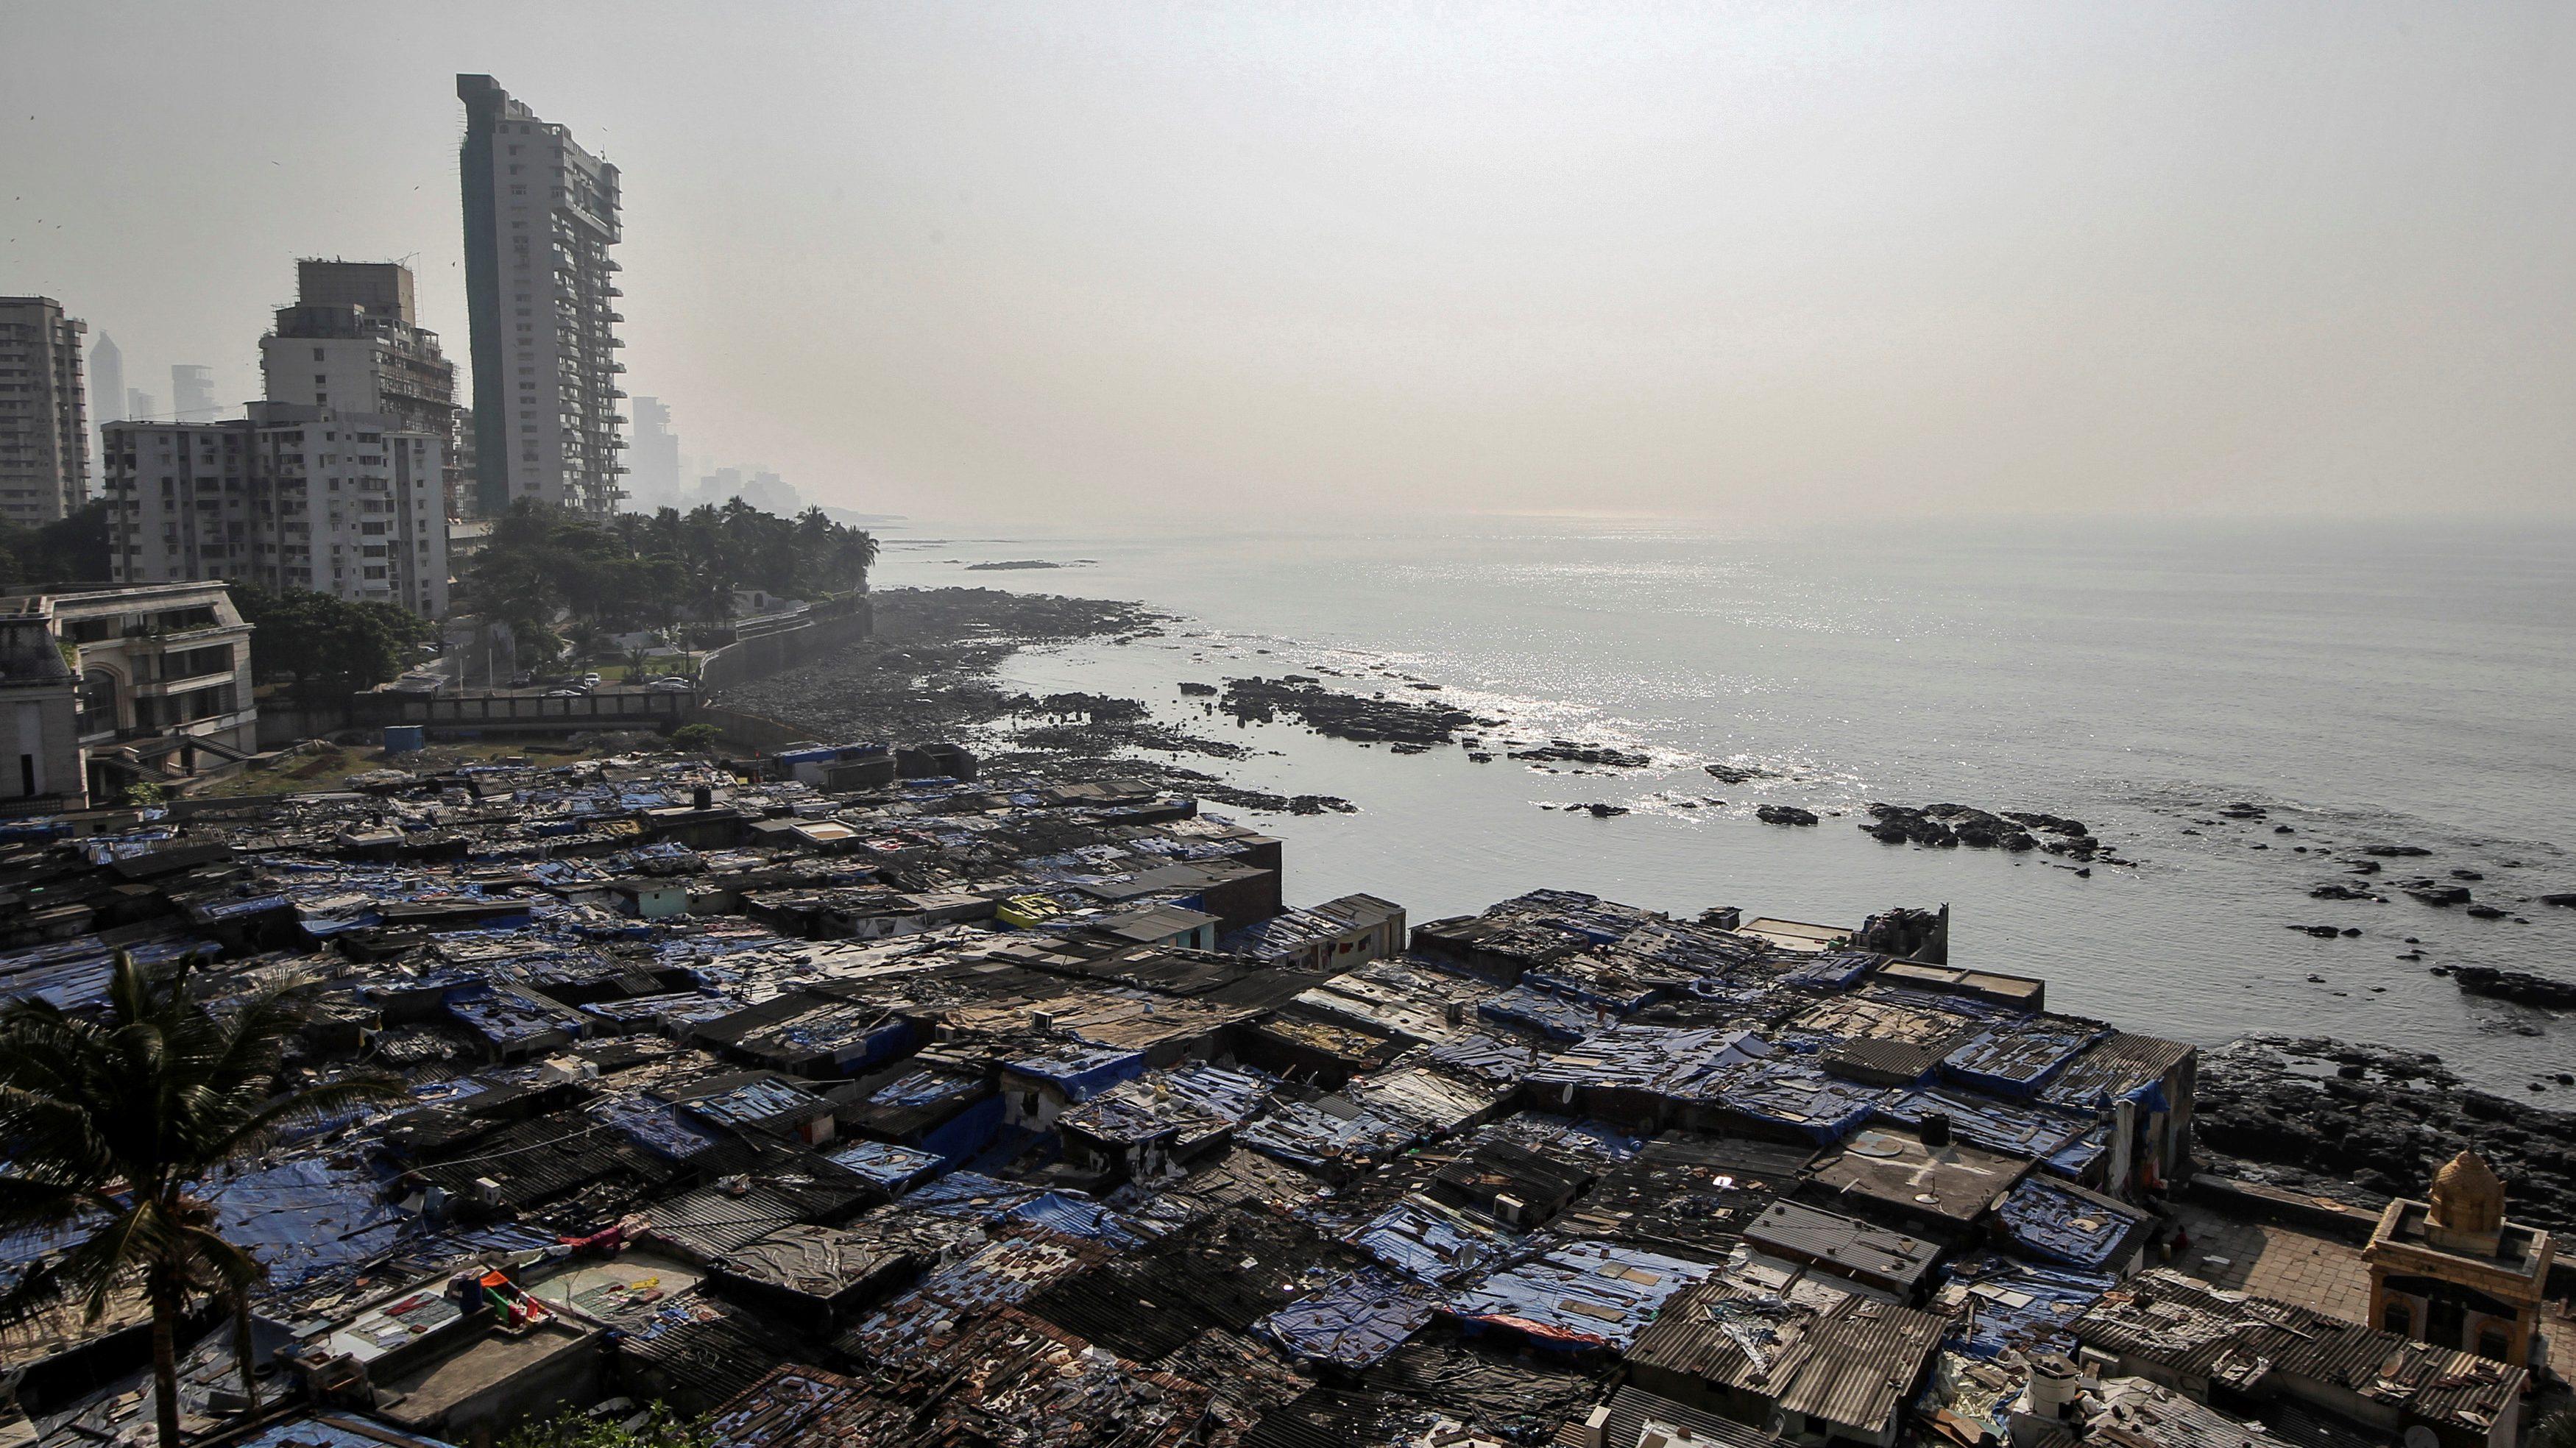 A view of a slum is seen along a seashore in Mumbai